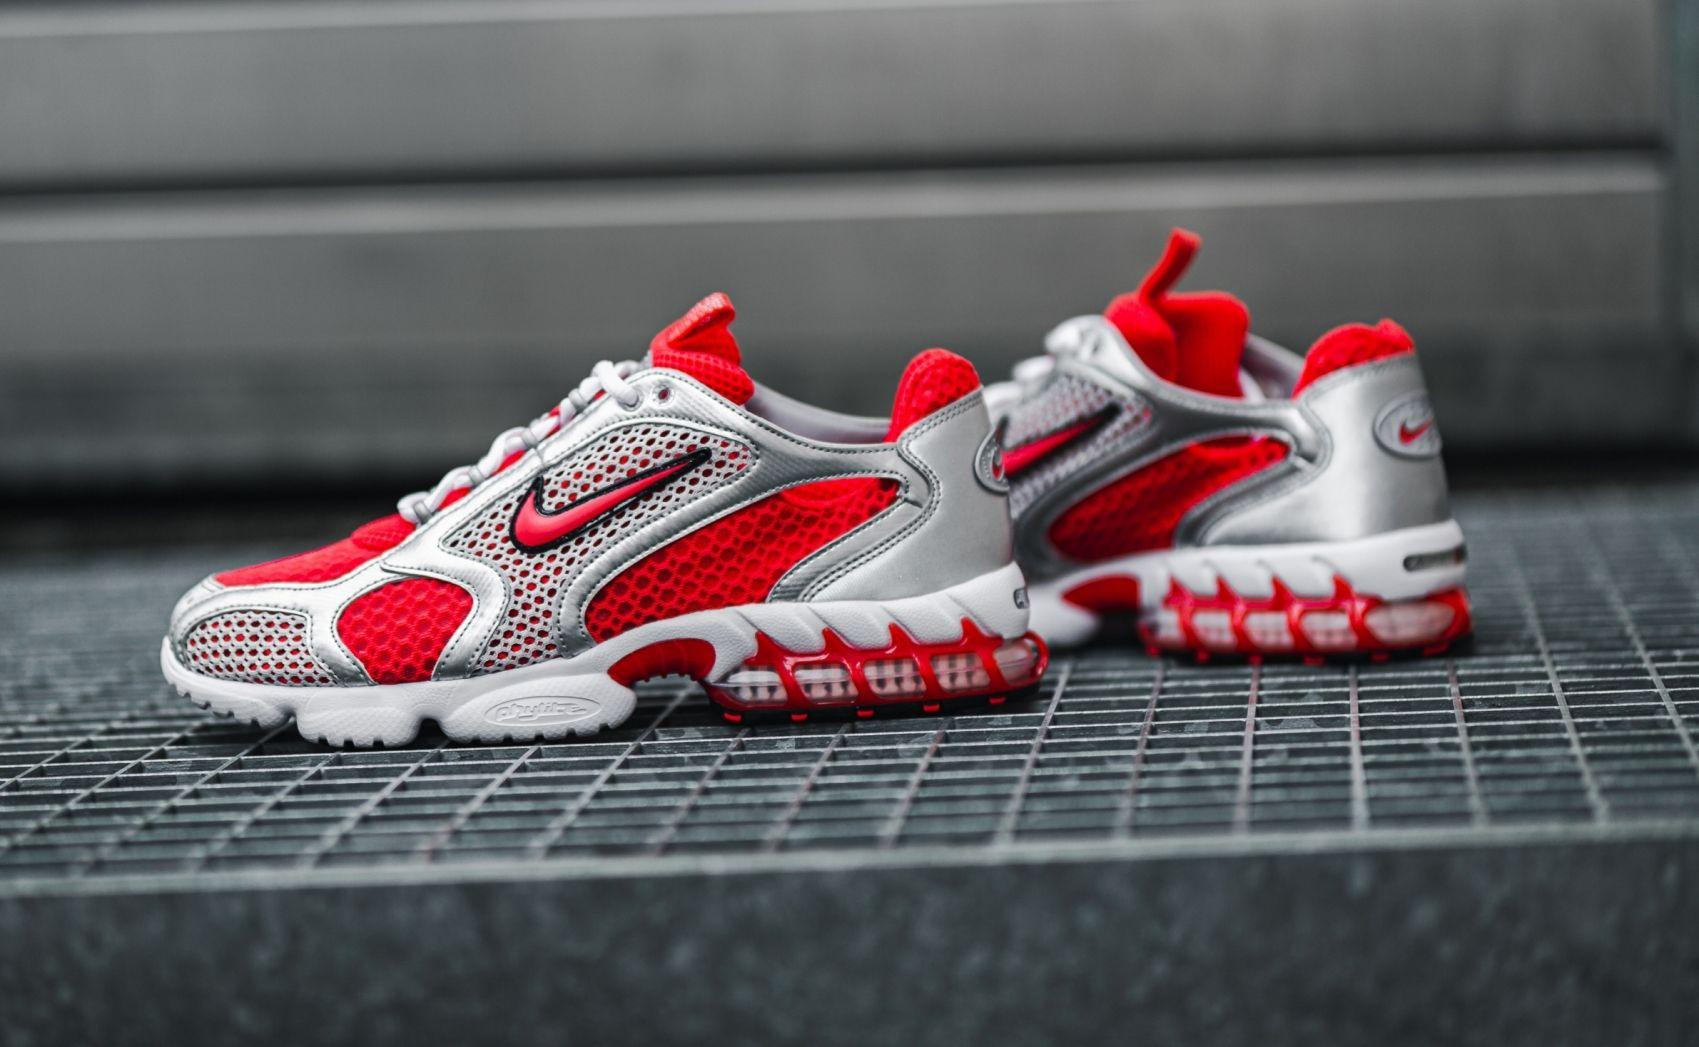 Nike Air Zoom Spiridon Cage Left